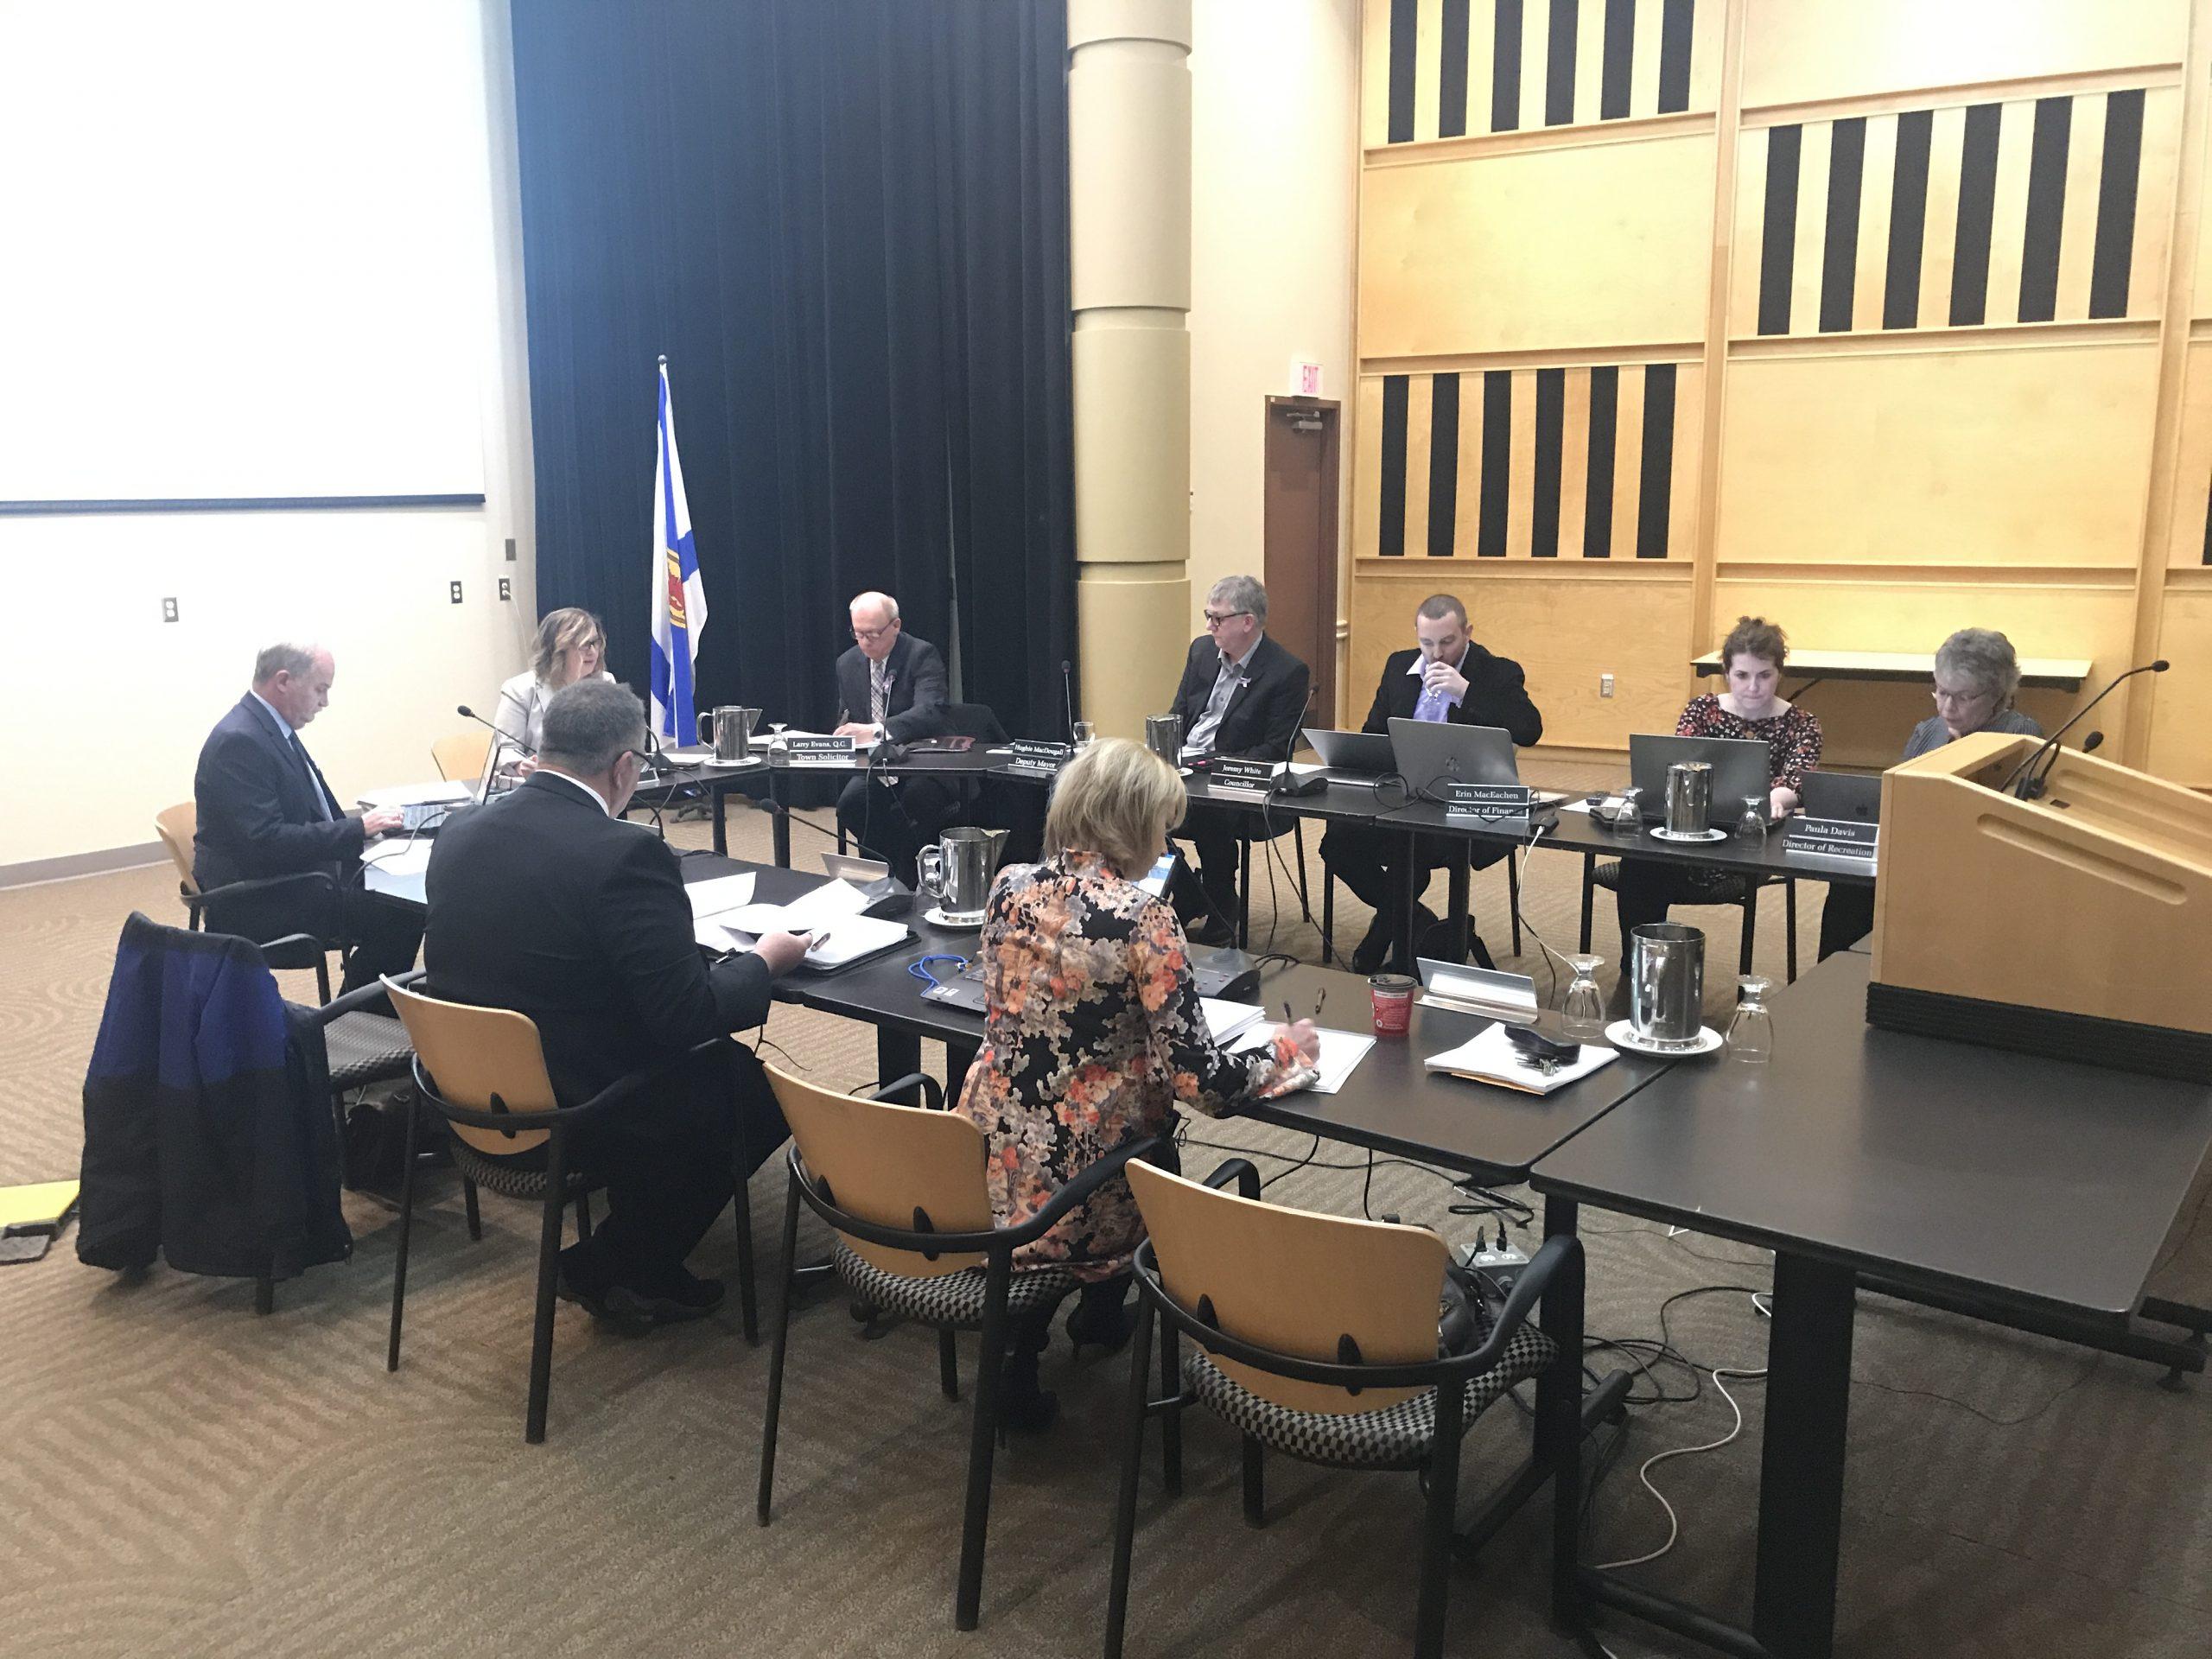 Waterfront committee membership approved in Port Hawkesbury